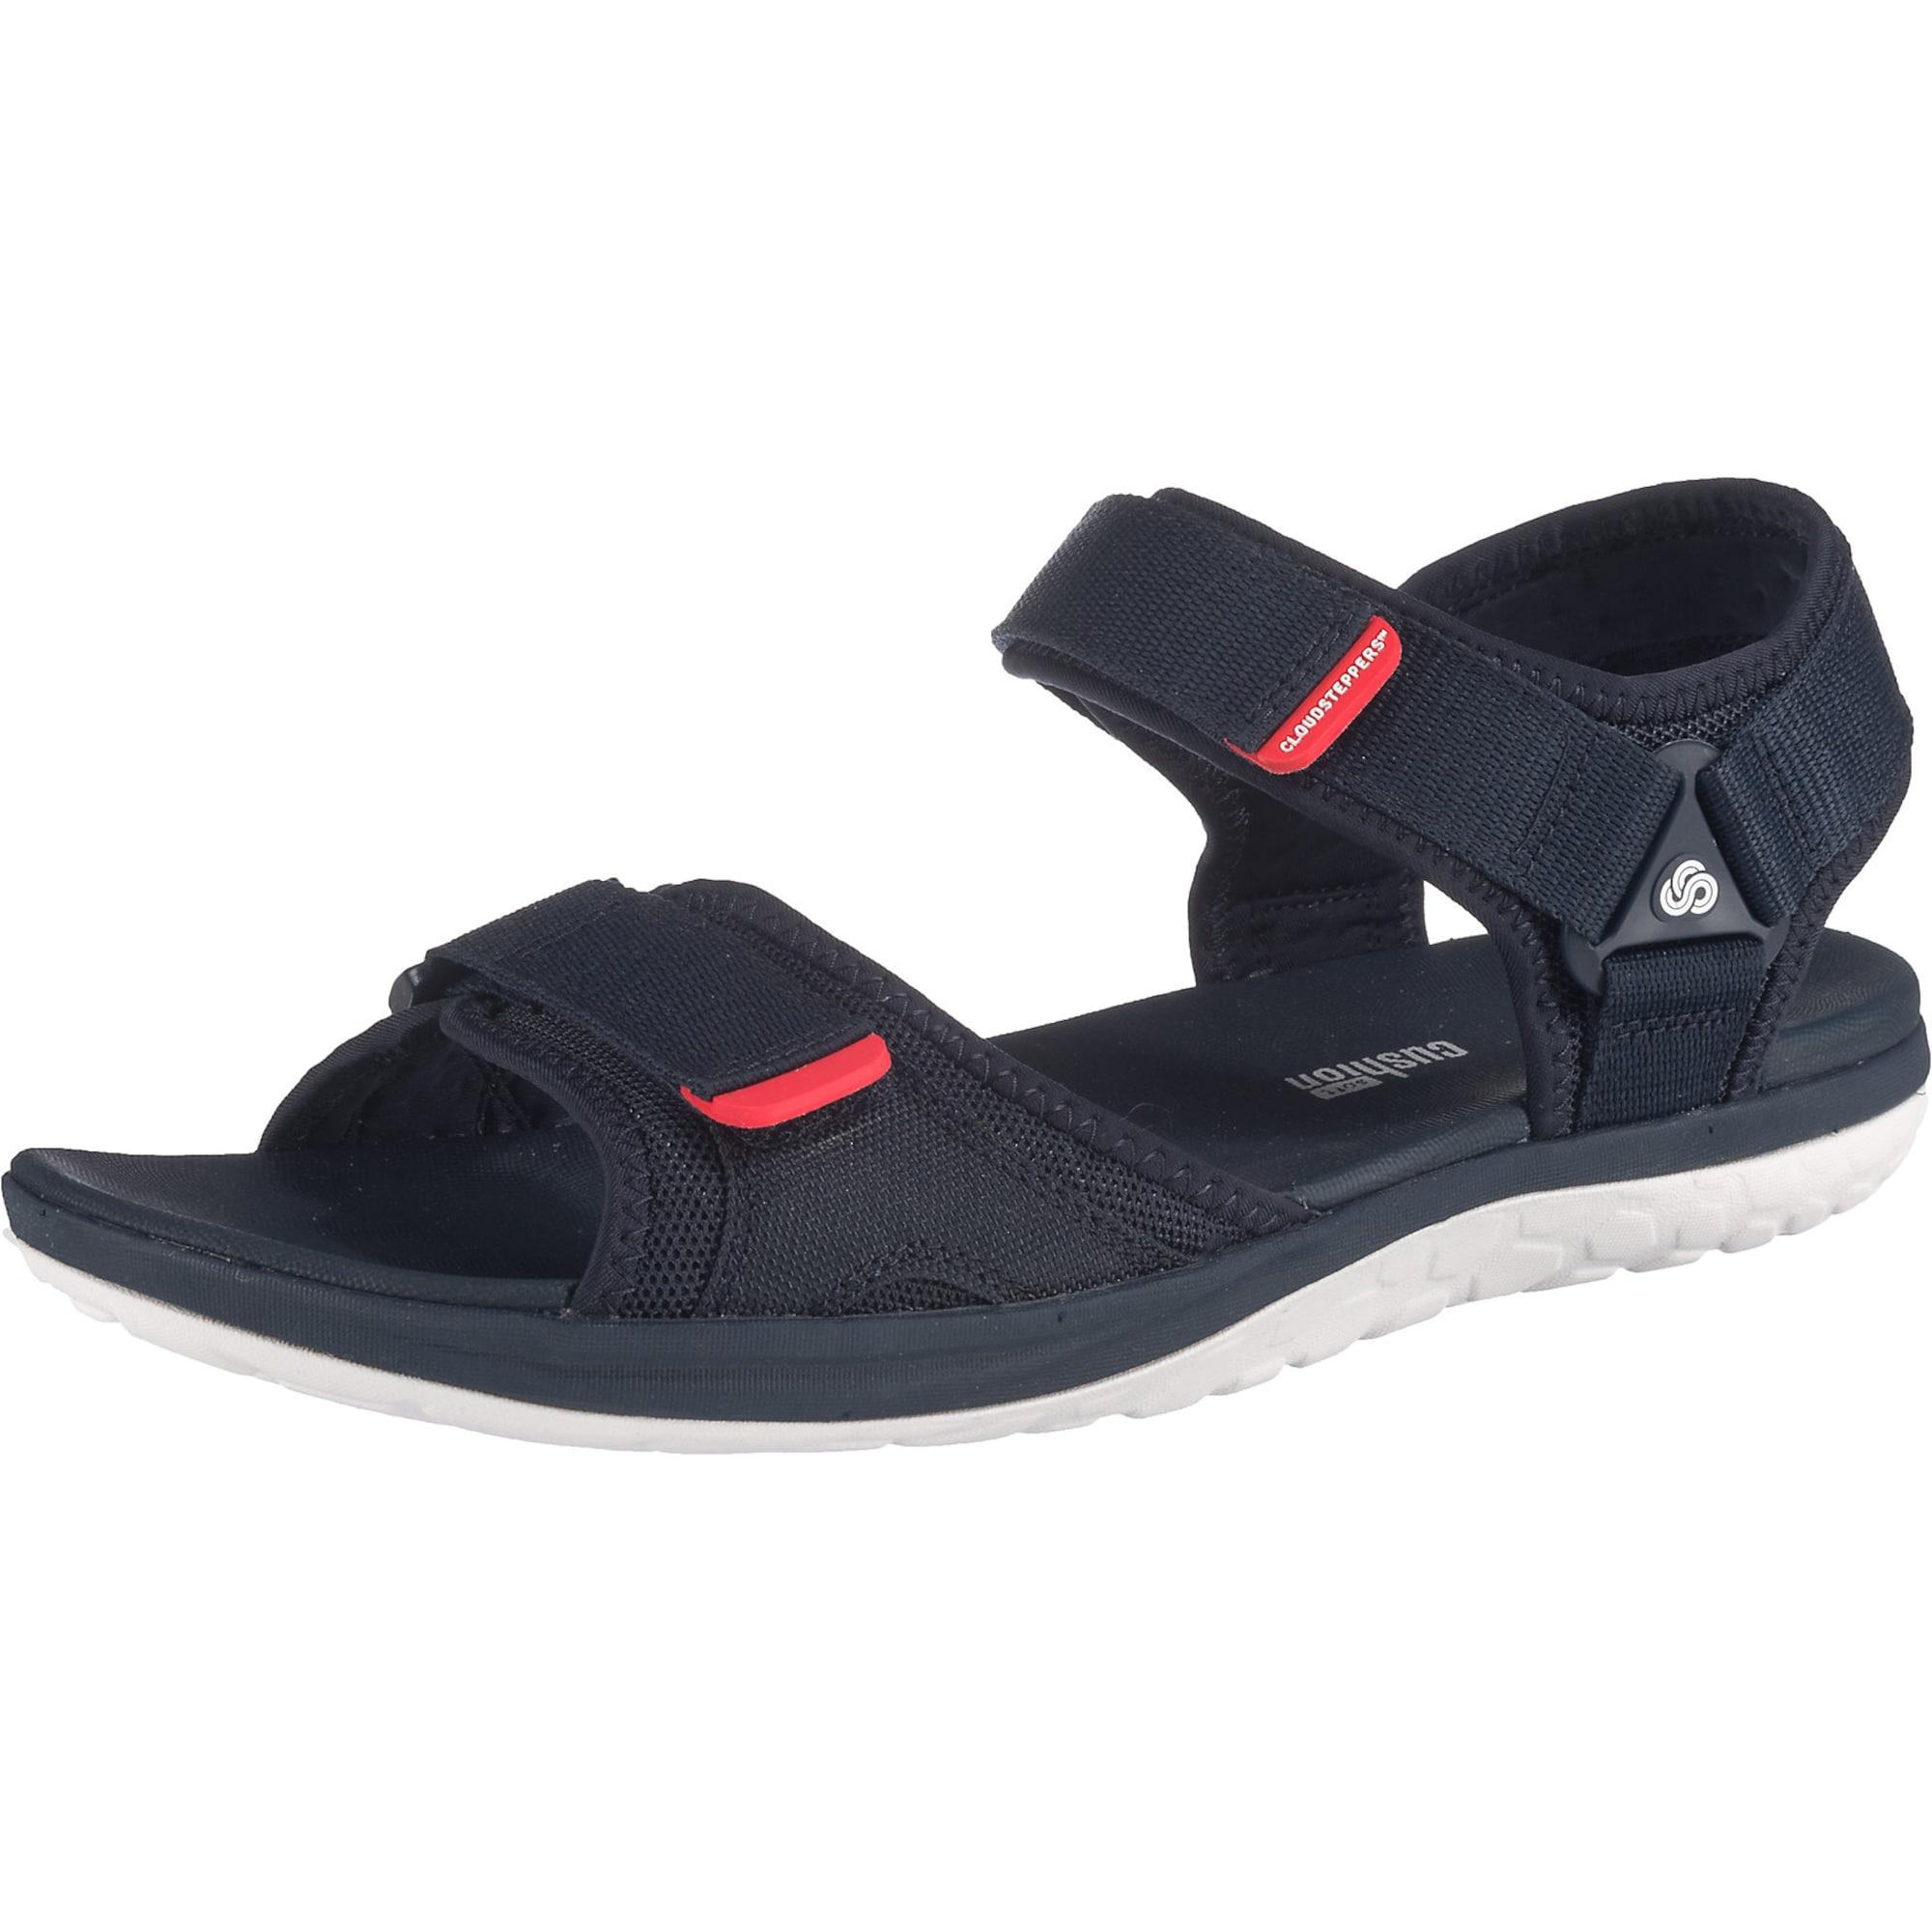 Herren - Sandalen 'Step Beat Sun'   Schuhe > Sandalen & Zehentrenner > Sandalen   Clarks